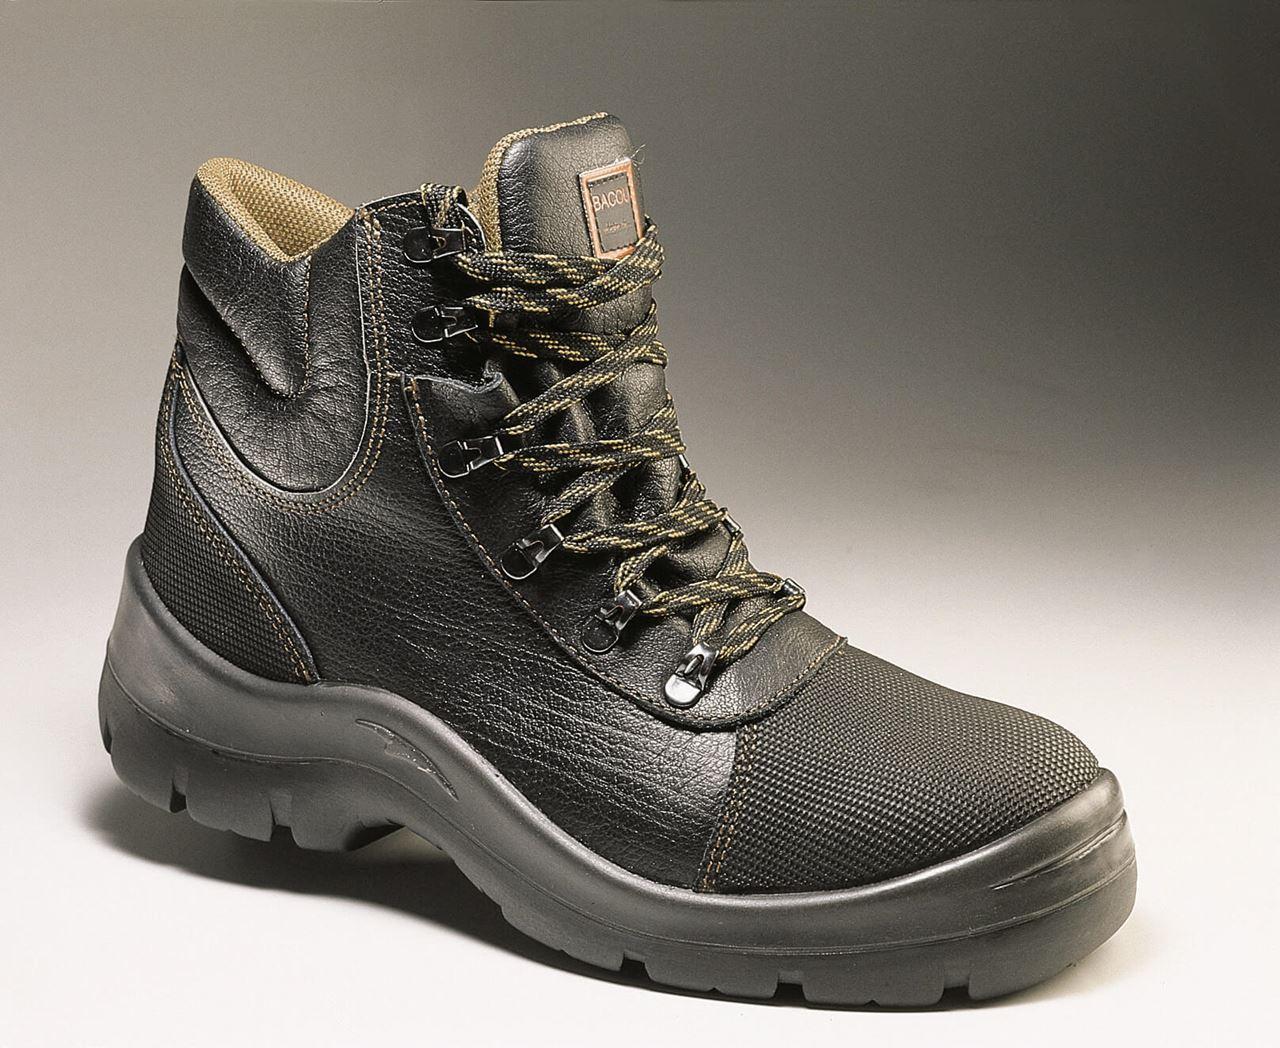 low priced b56db 36846 Honeywell Bac'Run Non-Metallic Toe Cap Ultra-light 716 S3 Safety Boots